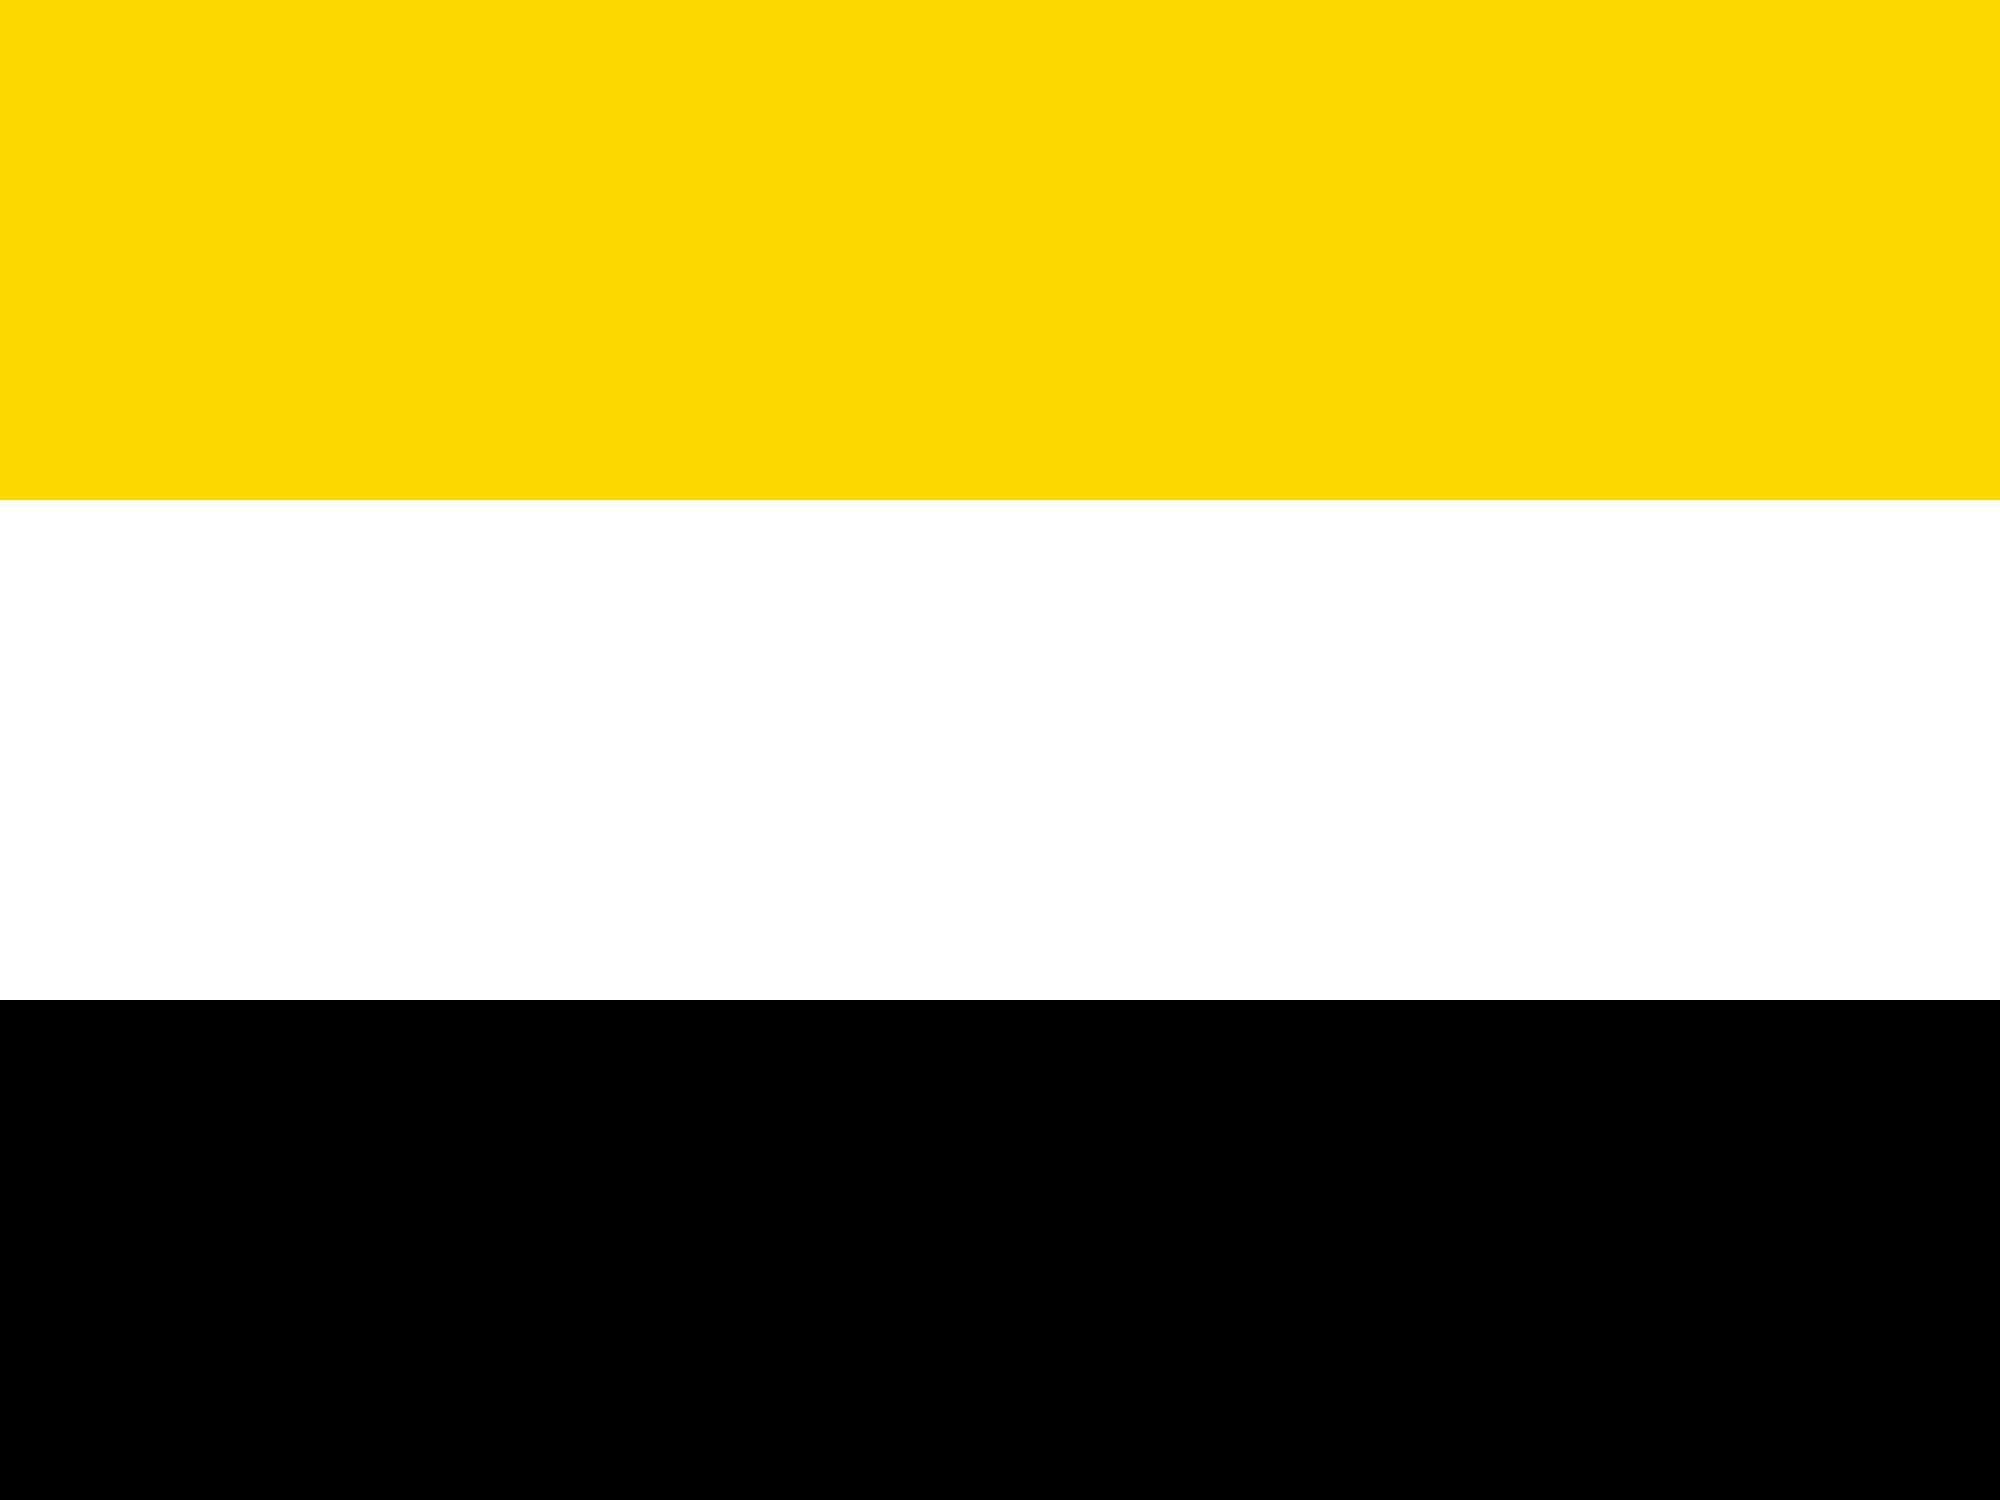 garifuna-flag